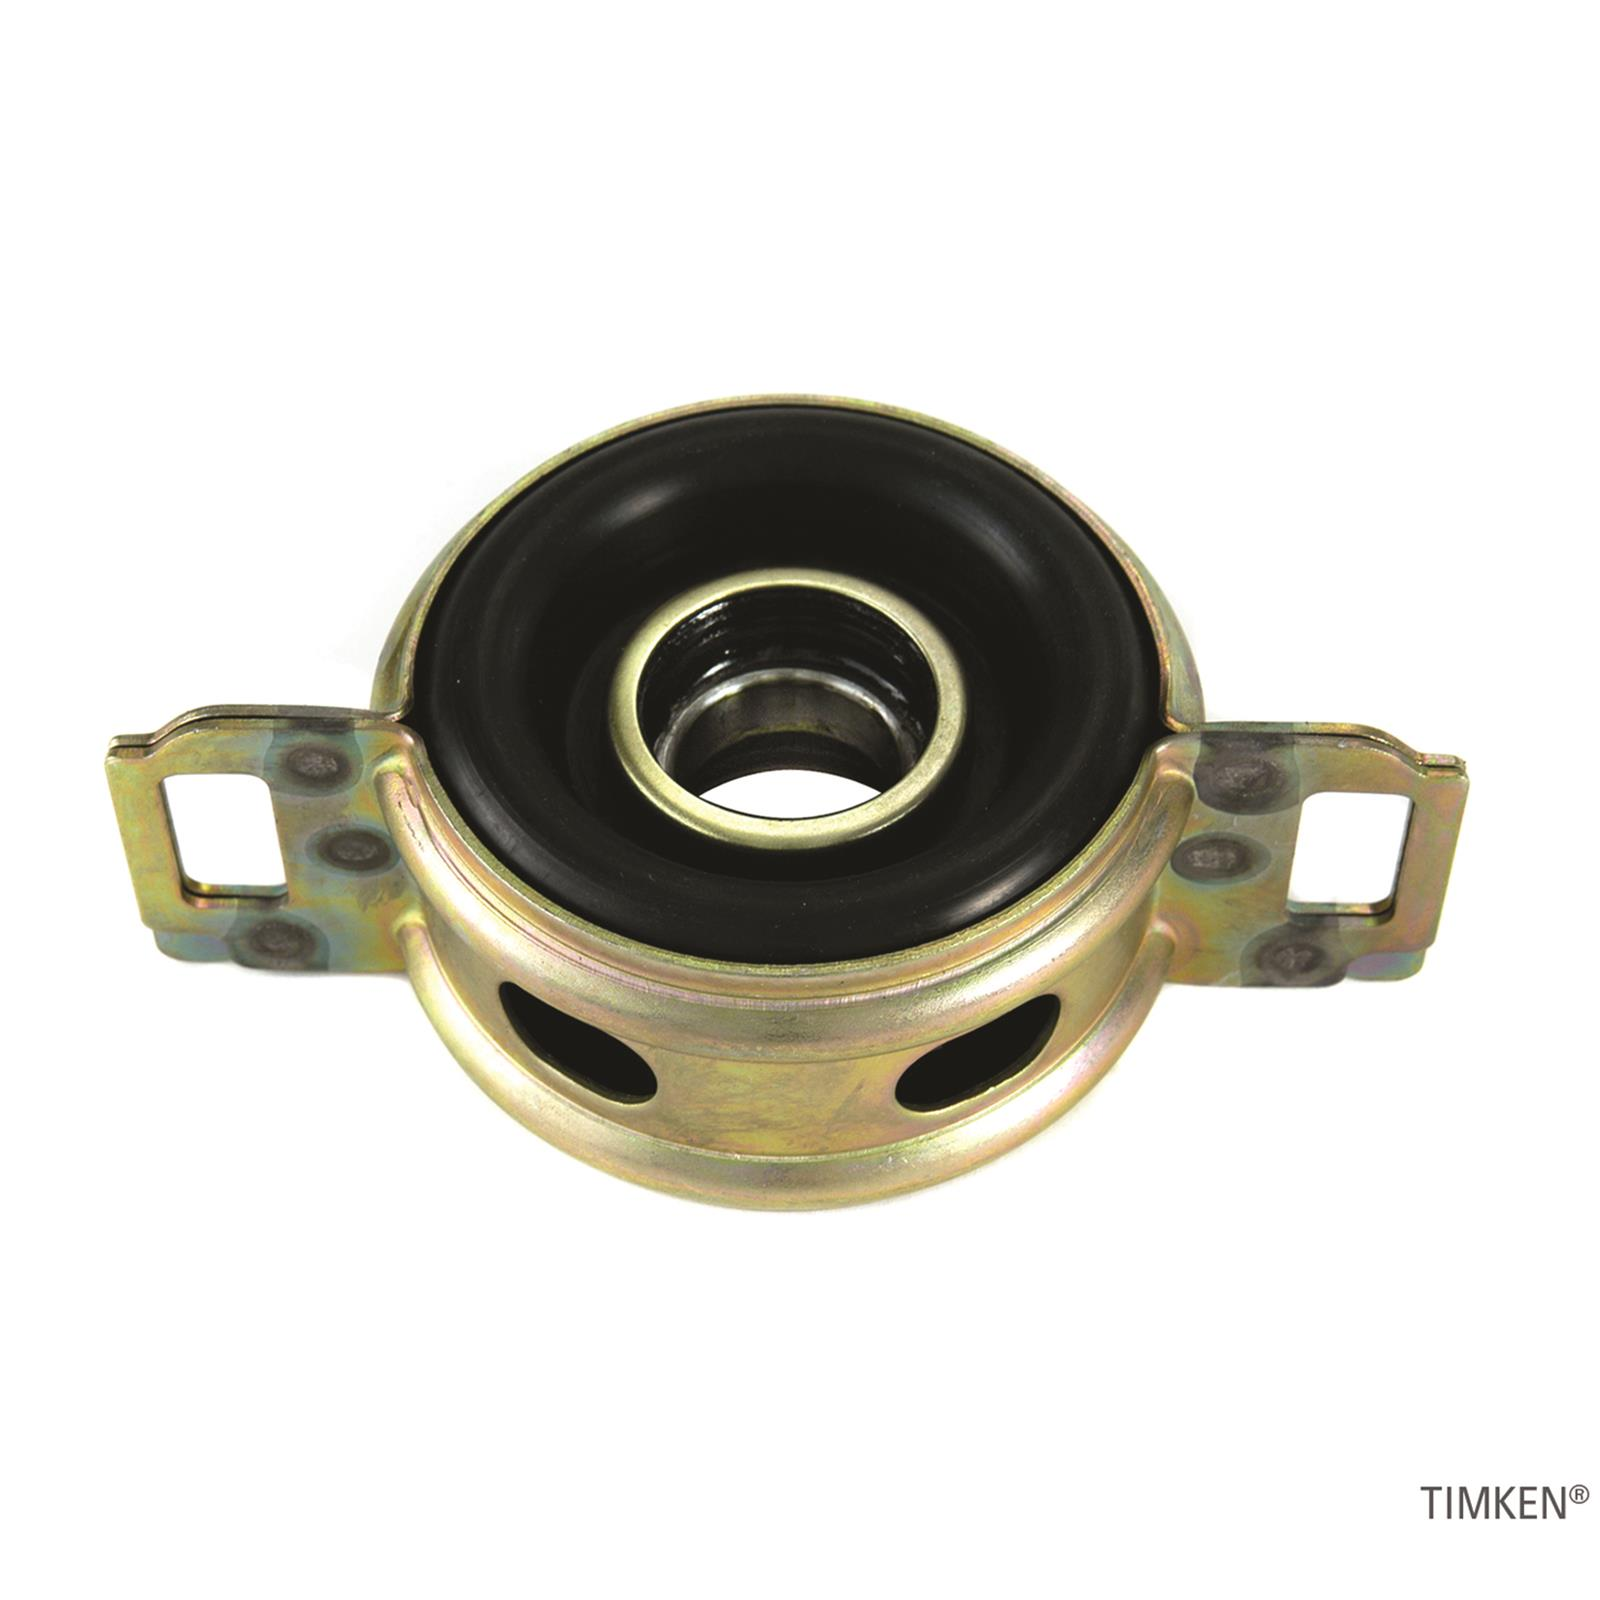 Timken HB26 Drive Shaft Center Support Bearing